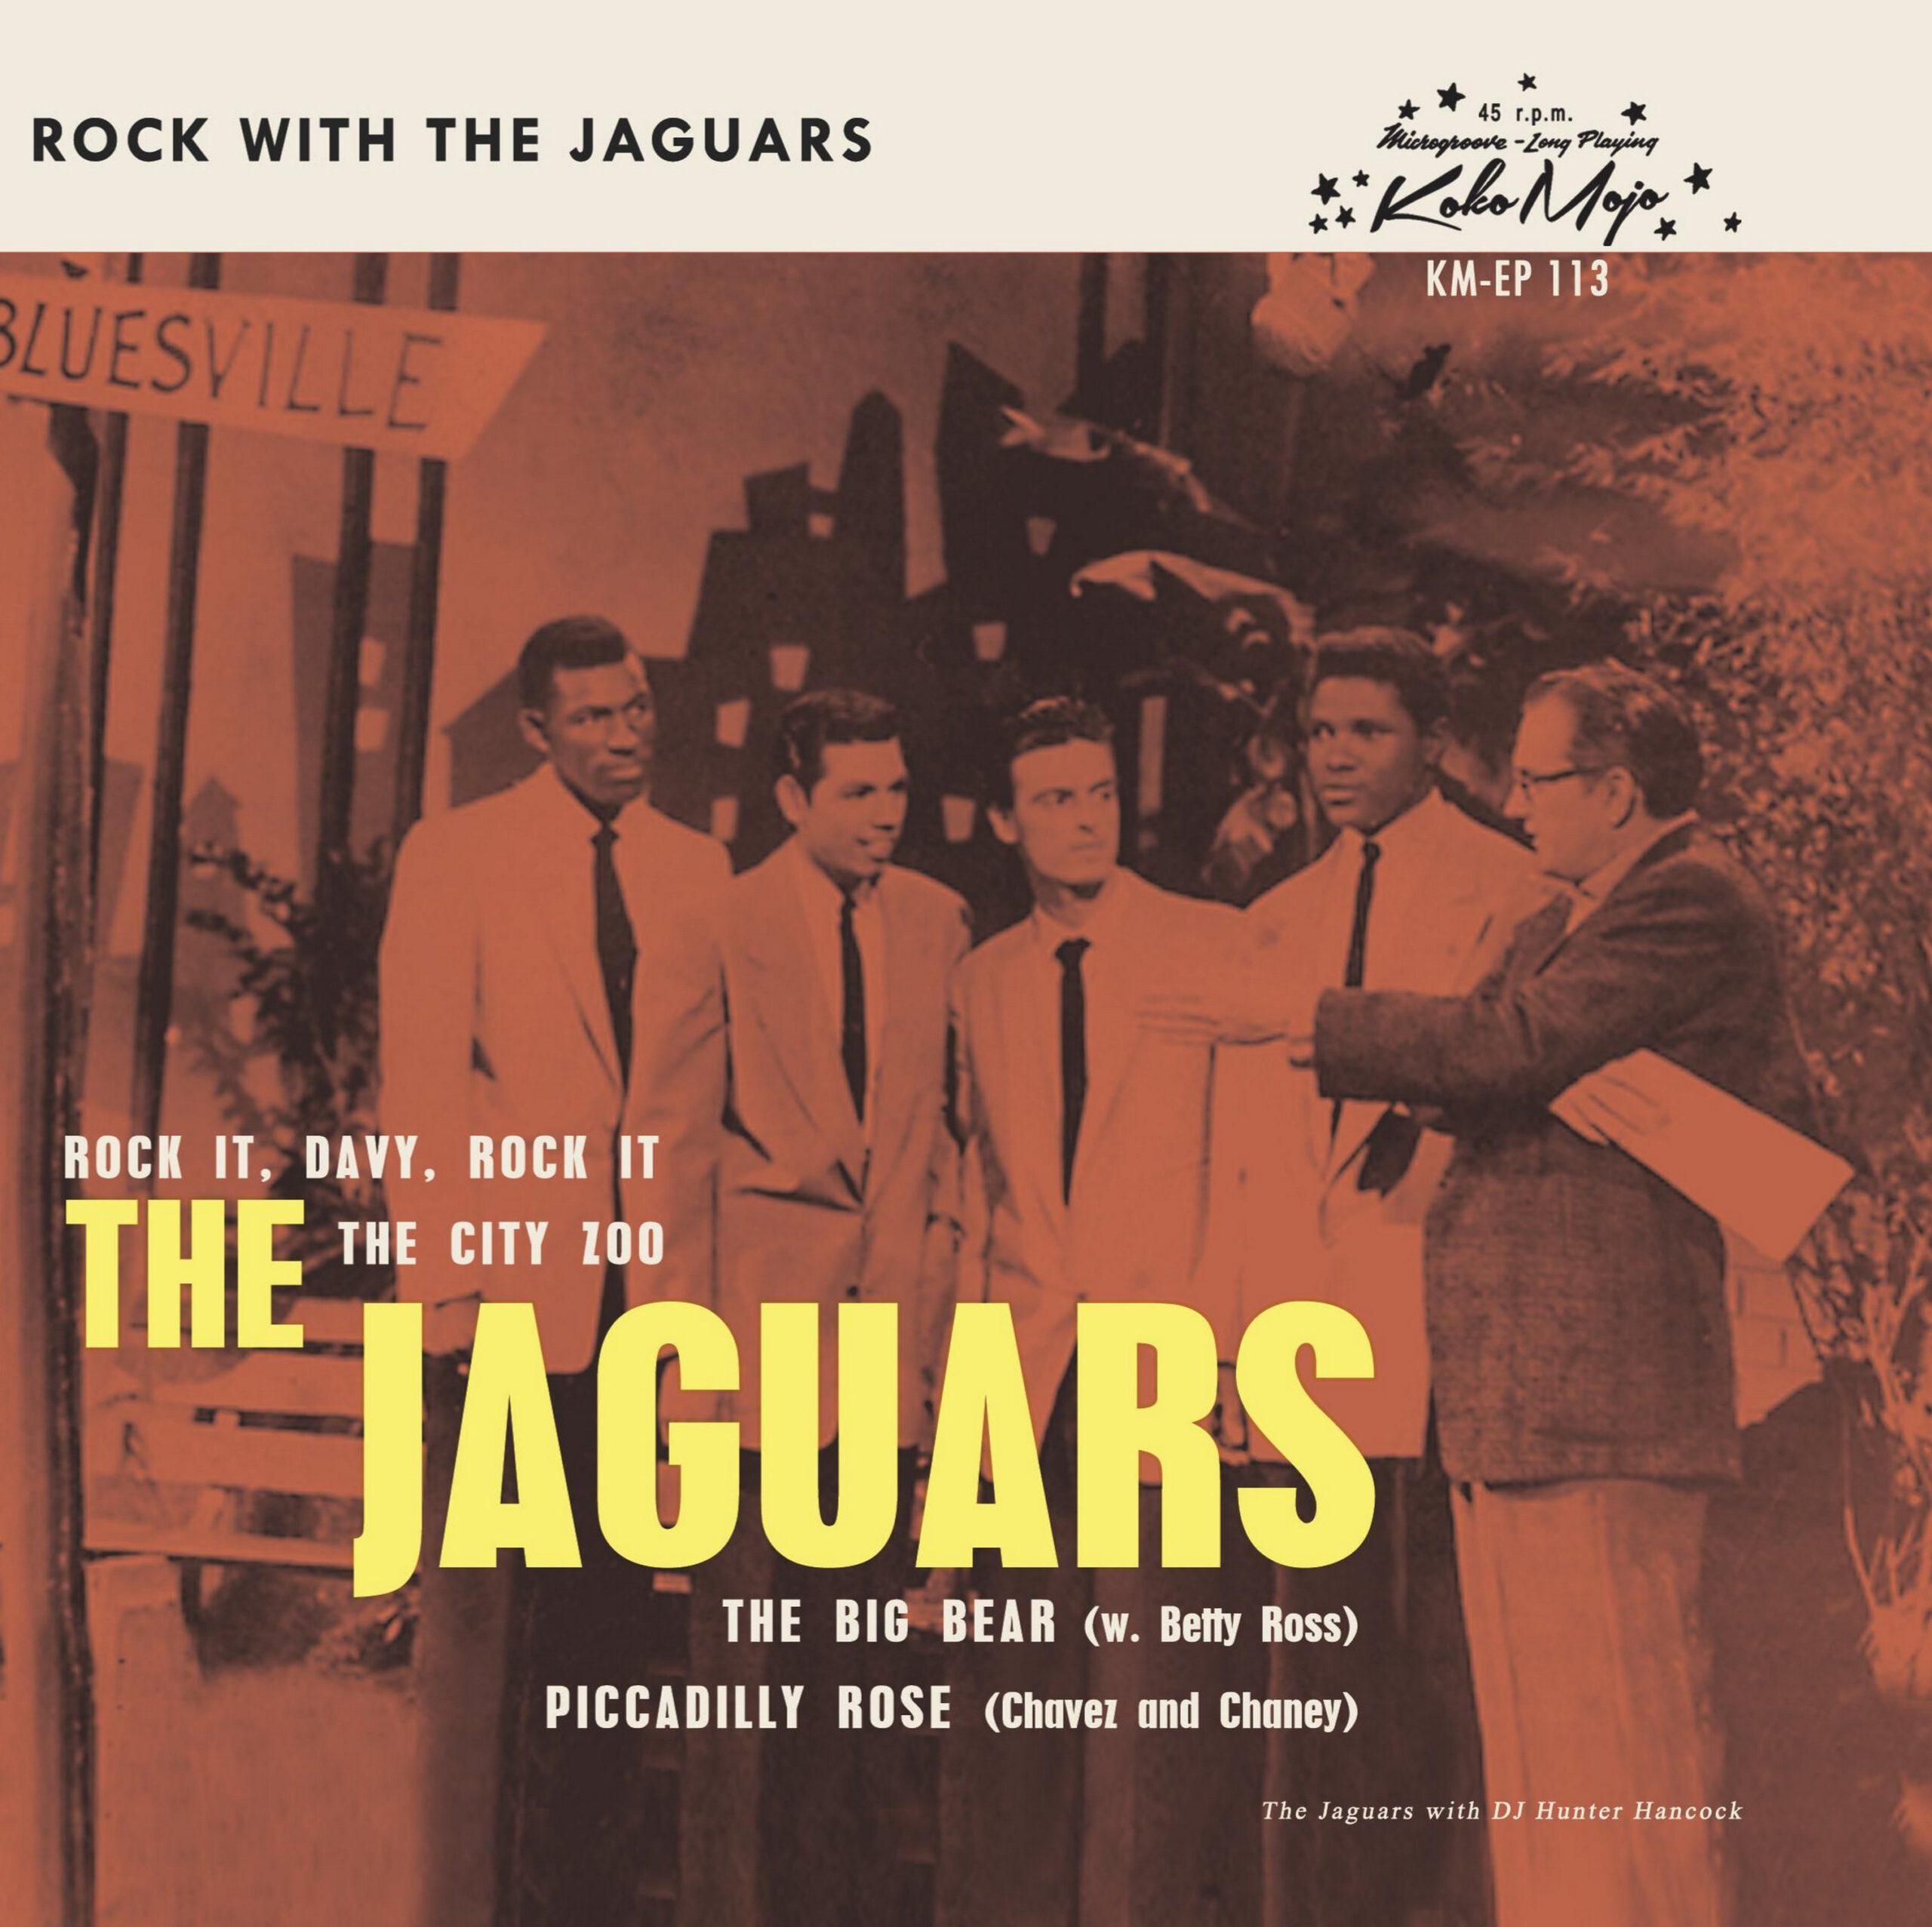 The Jaguars - Rock With The Jaguars